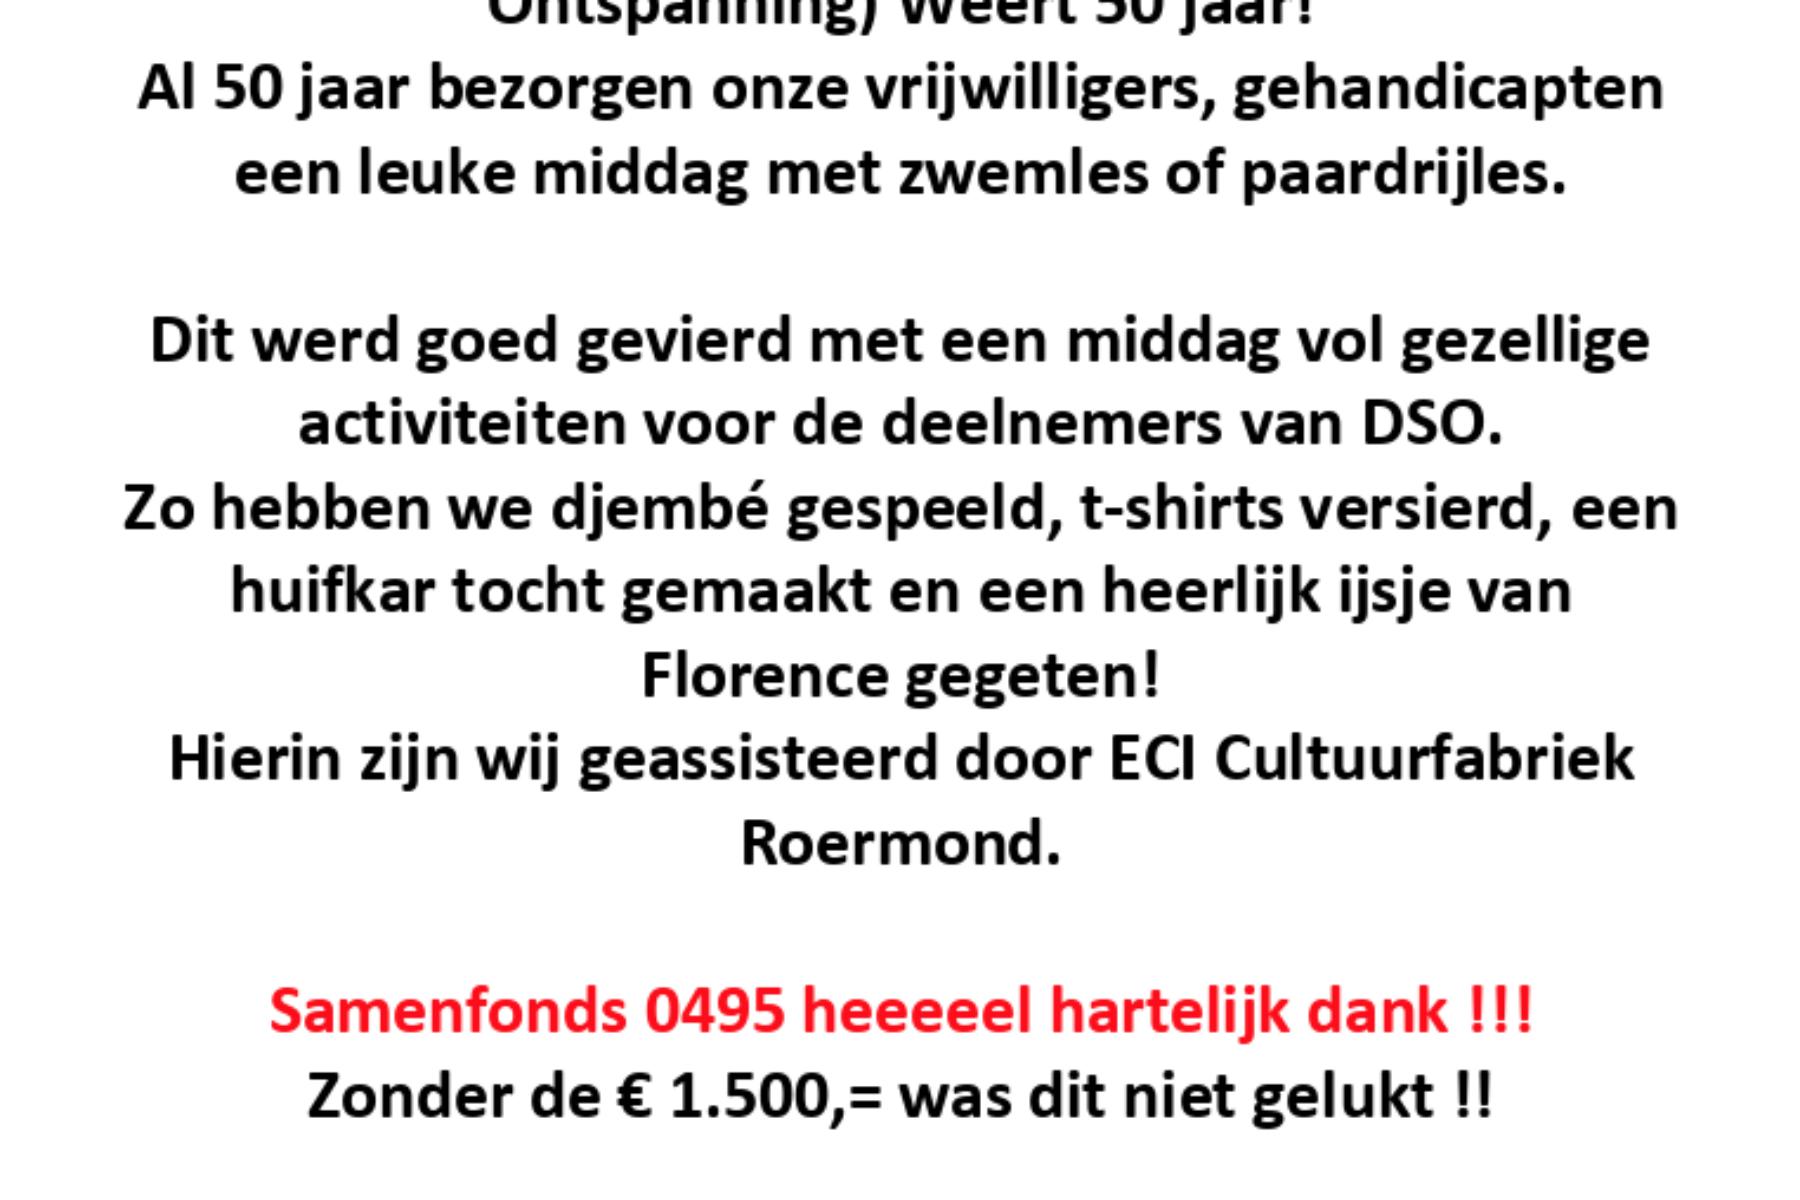 Stichting DSO: Door Sport Ontspanning